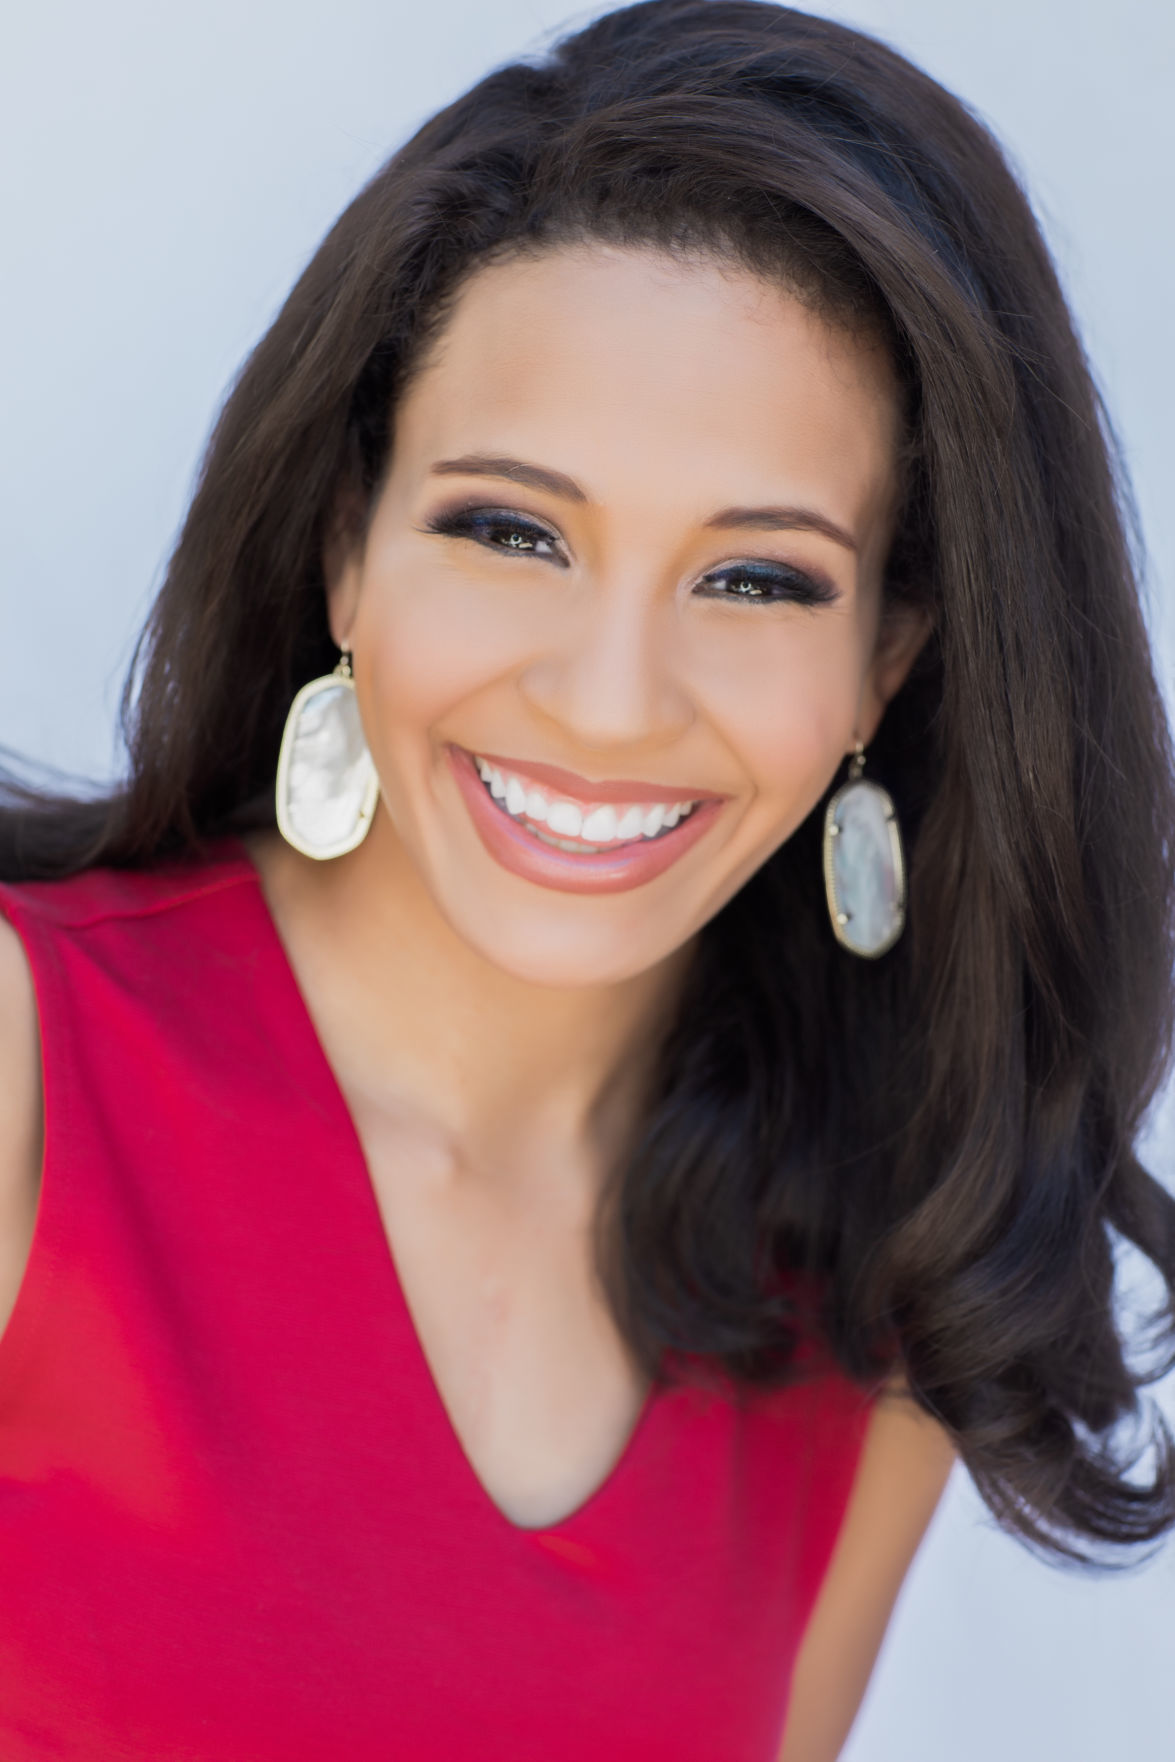 Miss West Virginia 2018 Madeline Morris Collins